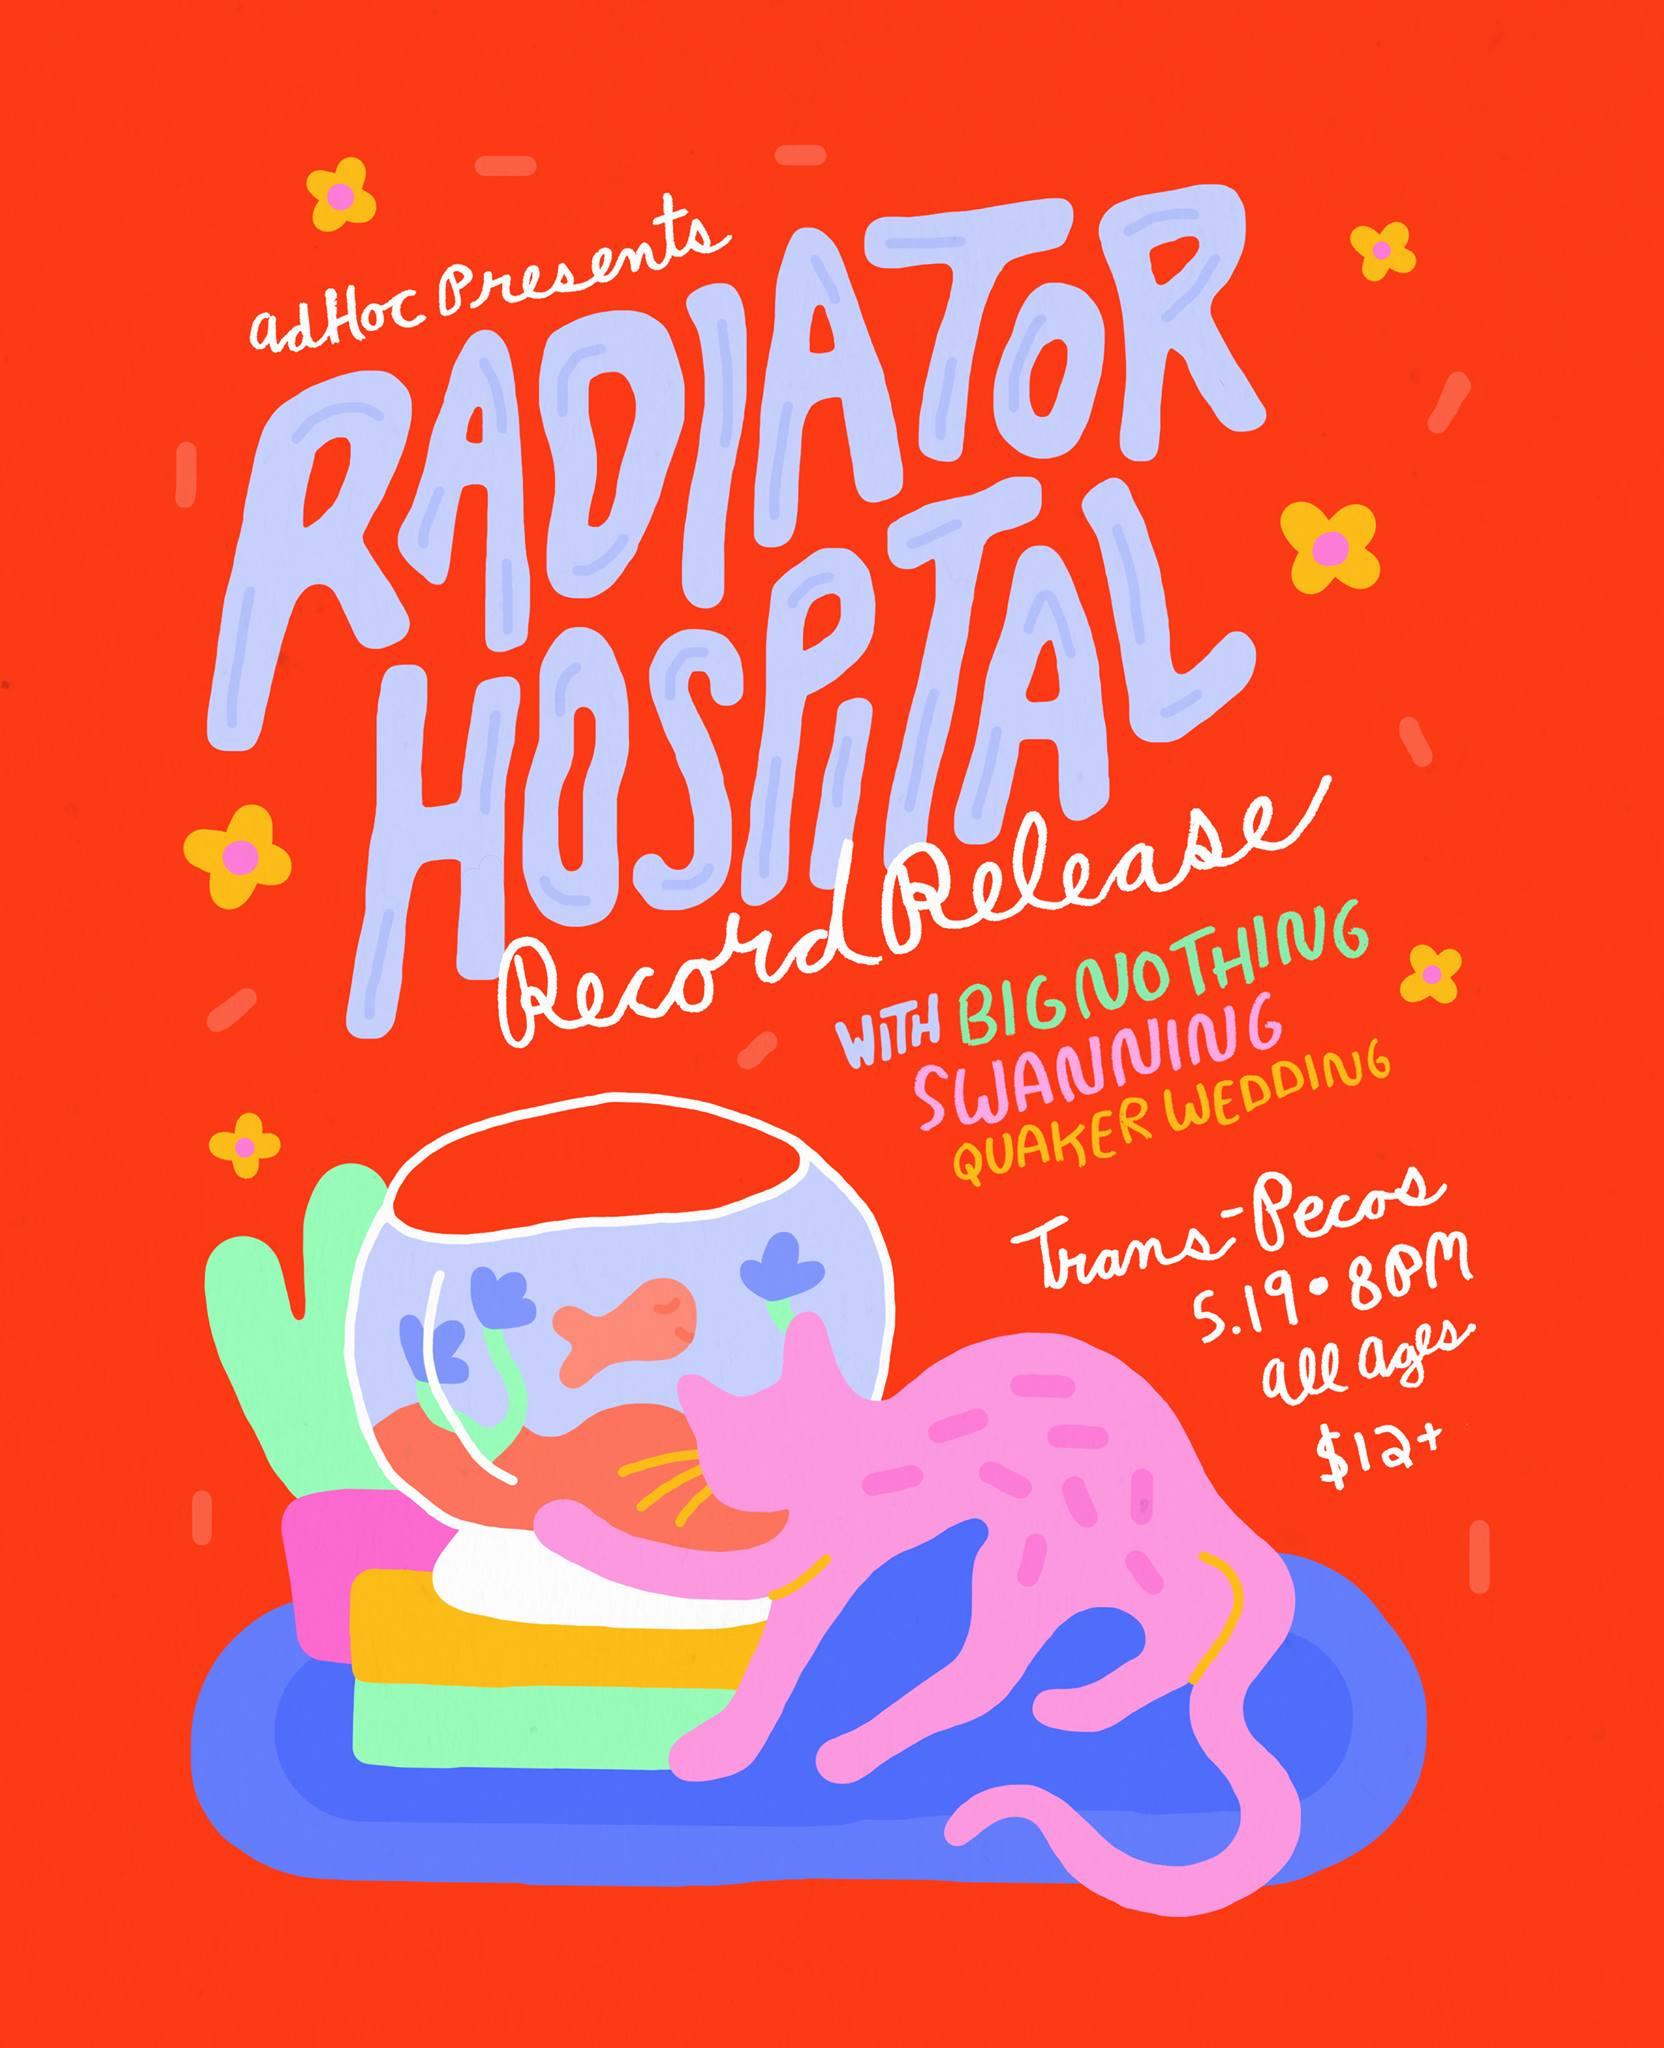 radiator hospital2.jpg